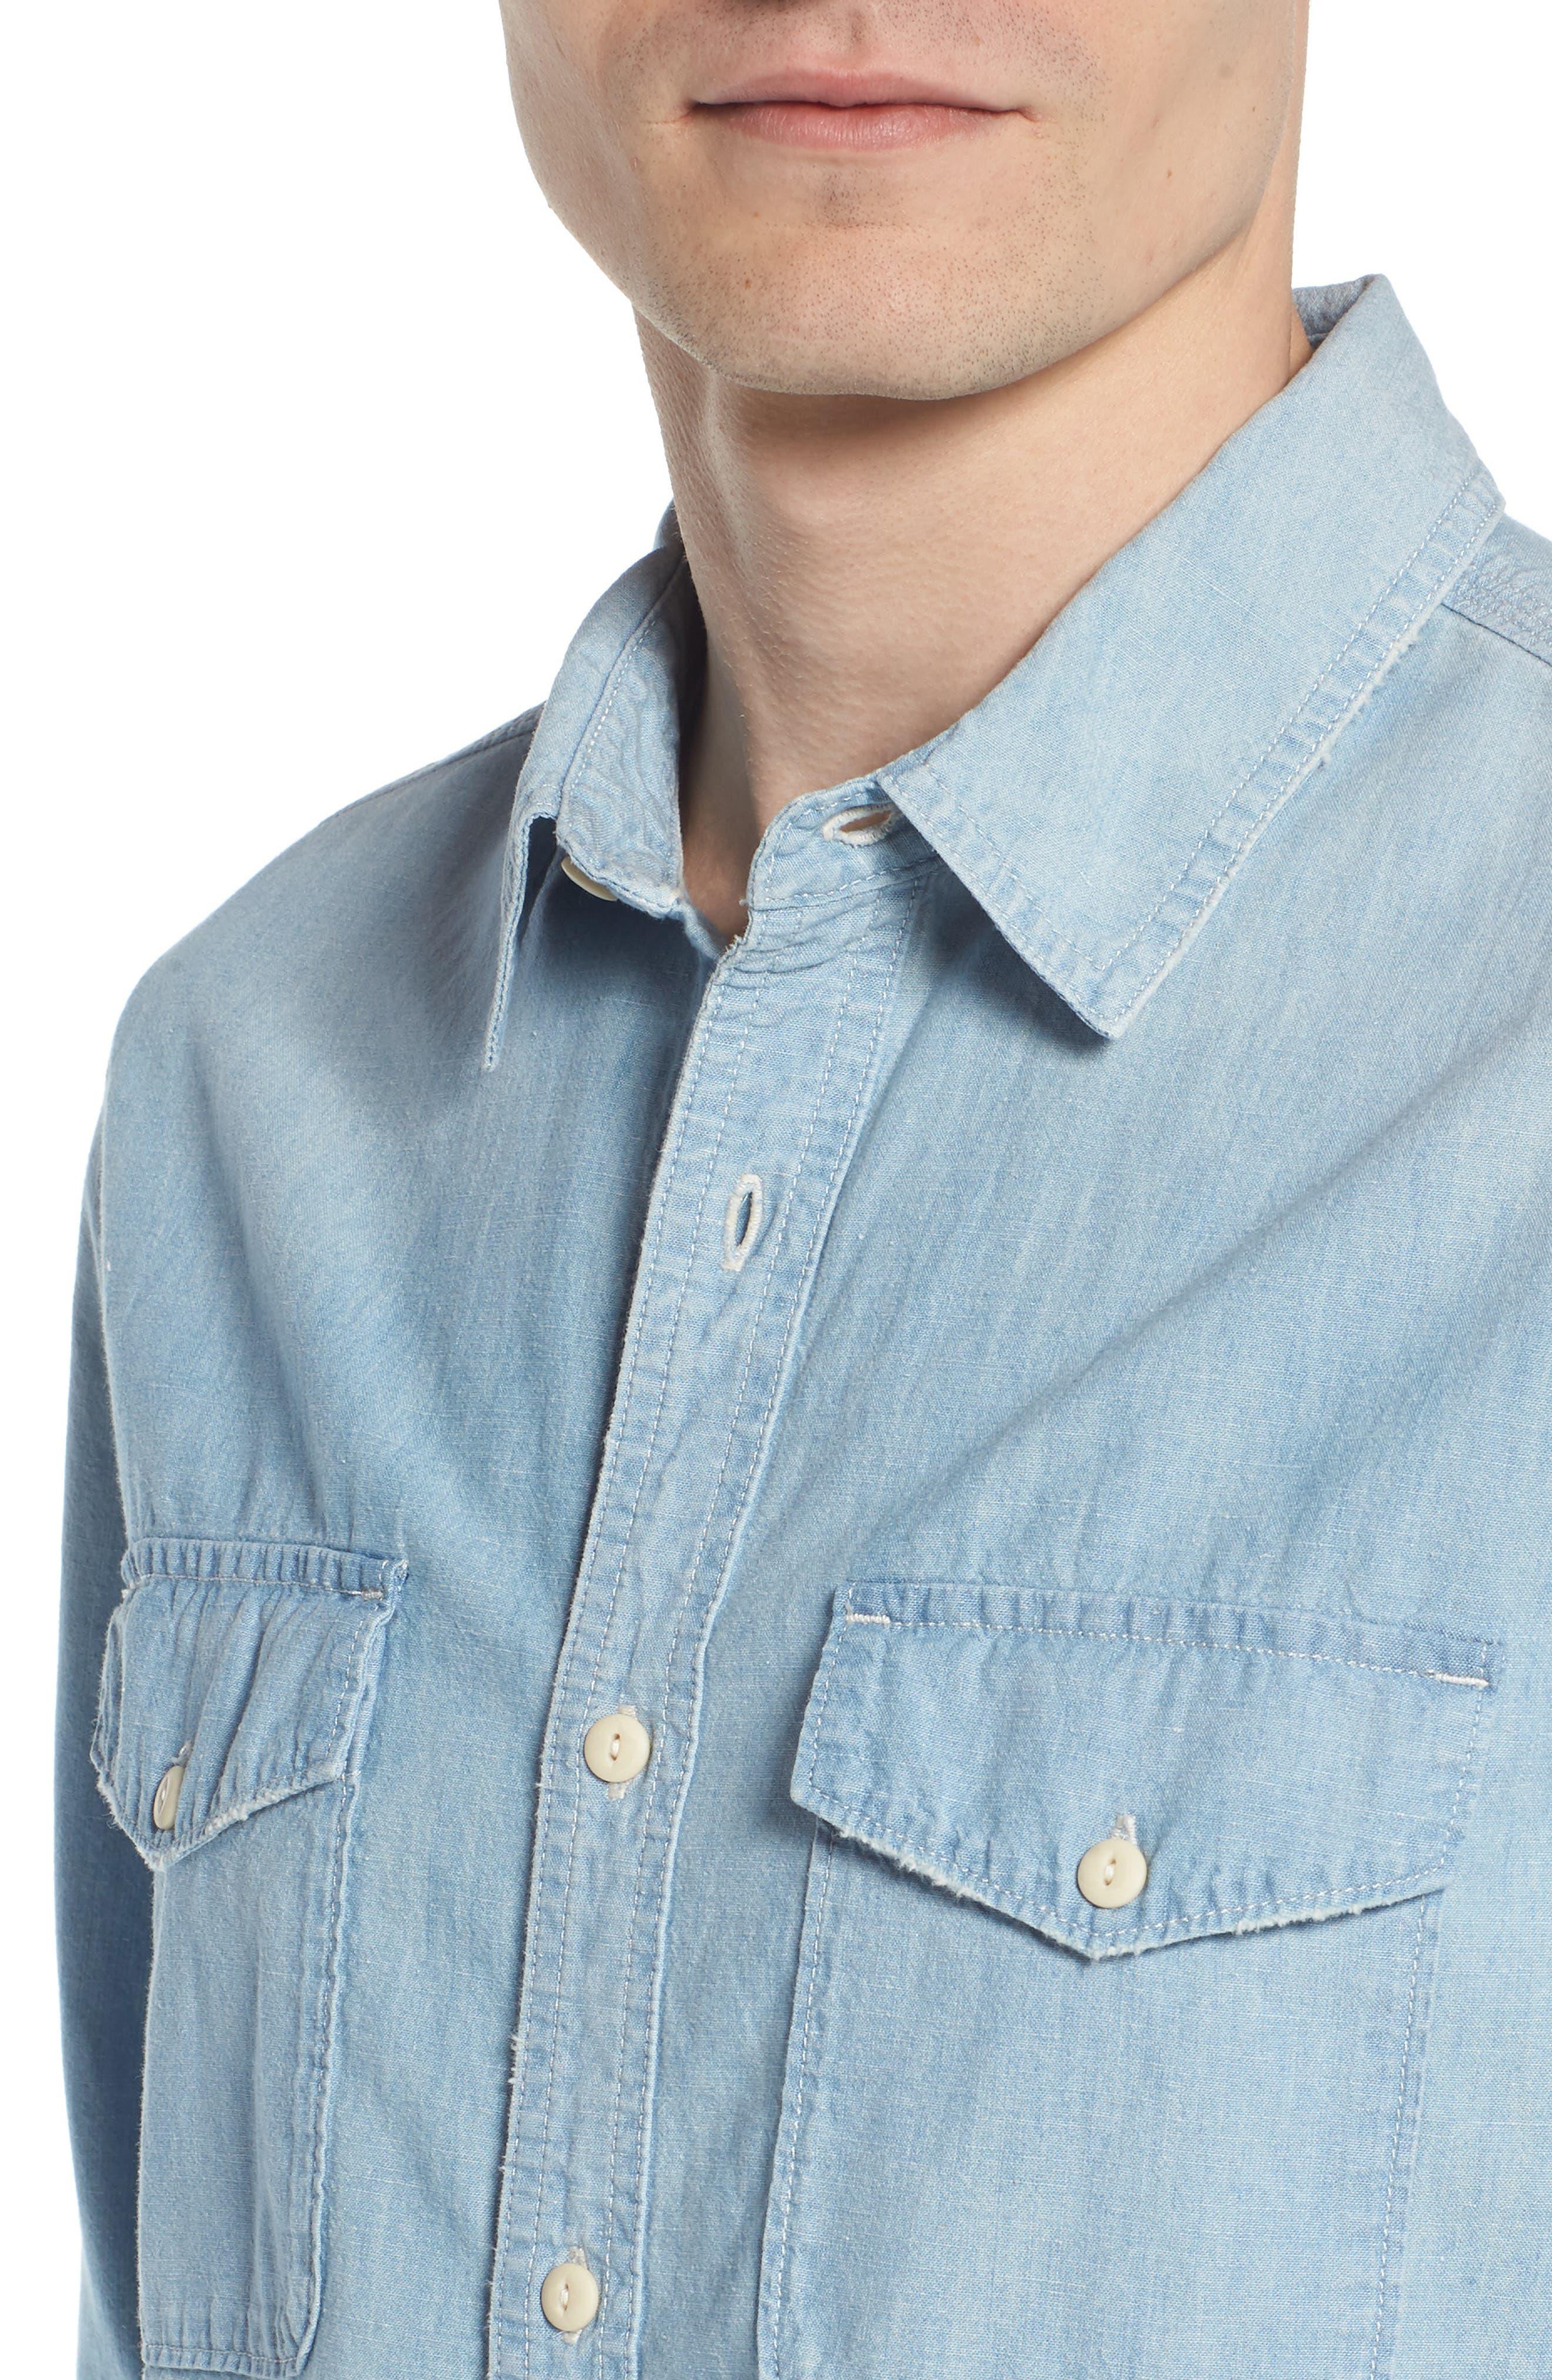 Benning Regular Fit Sport Shirt,                             Alternate thumbnail 4, color,                             499